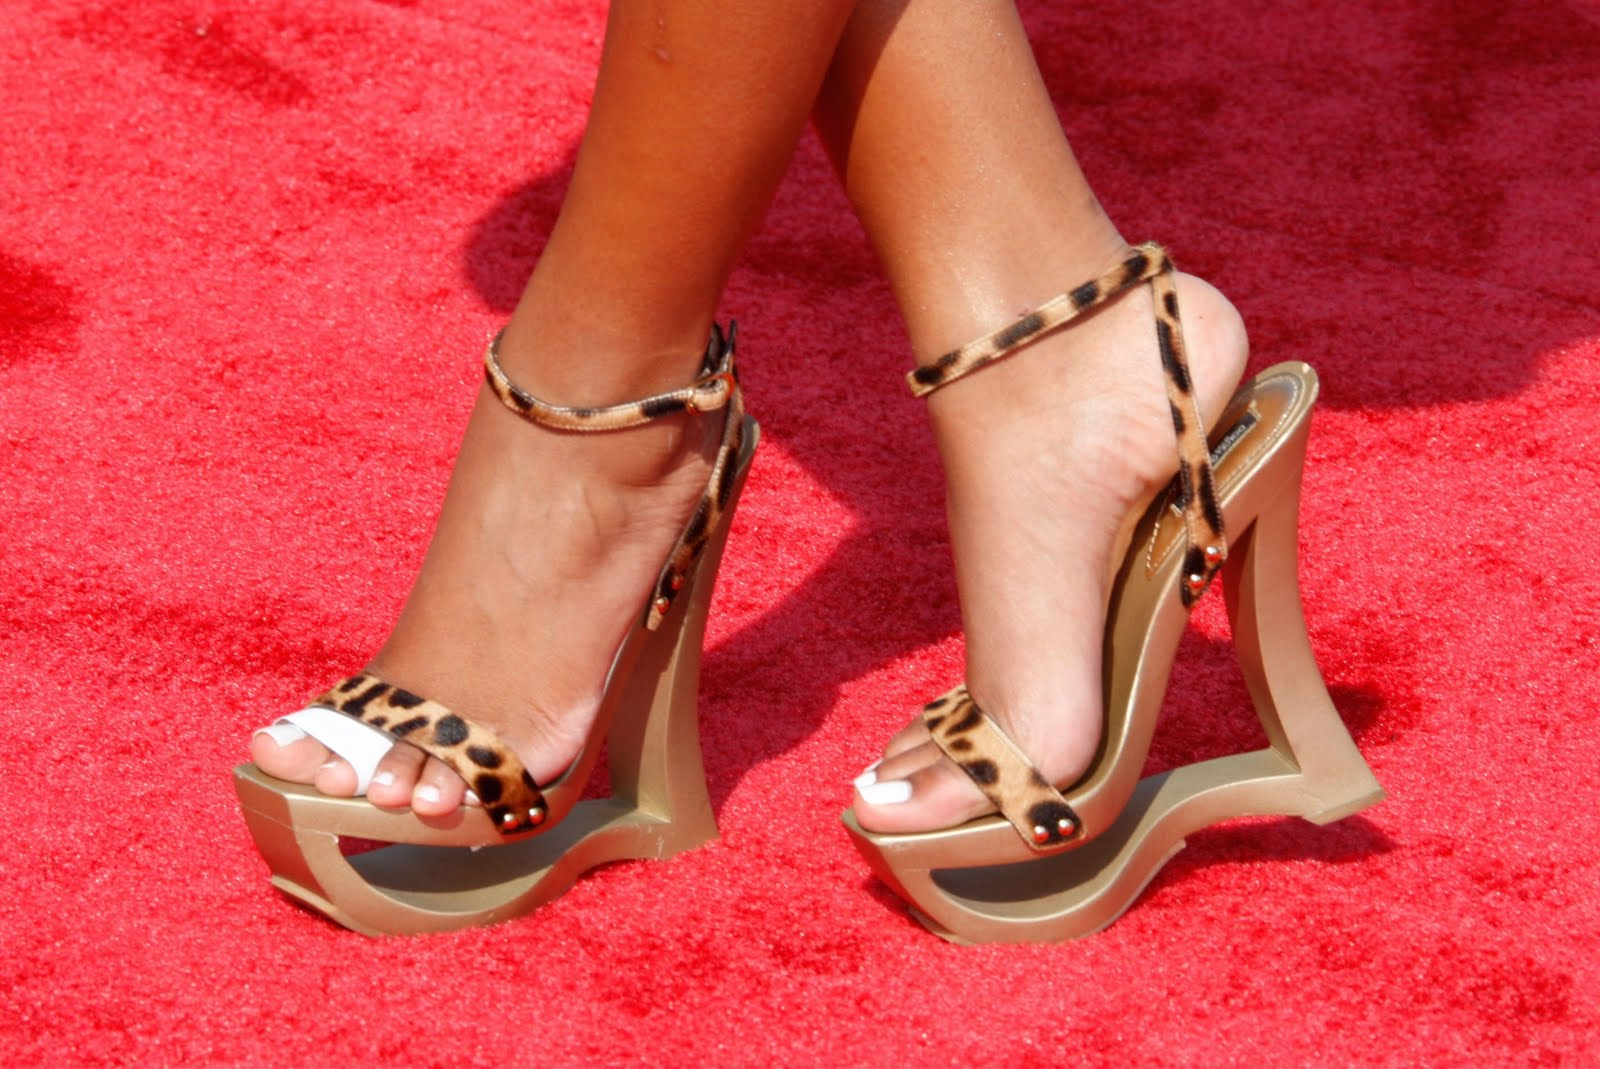 http://2.bp.blogspot.com/_UaLWp72nij4/TEddtThvR7I/AAAAAAAAR7E/ij_yxW1d2Sg/s1600/solange-knowles-feet.jpg